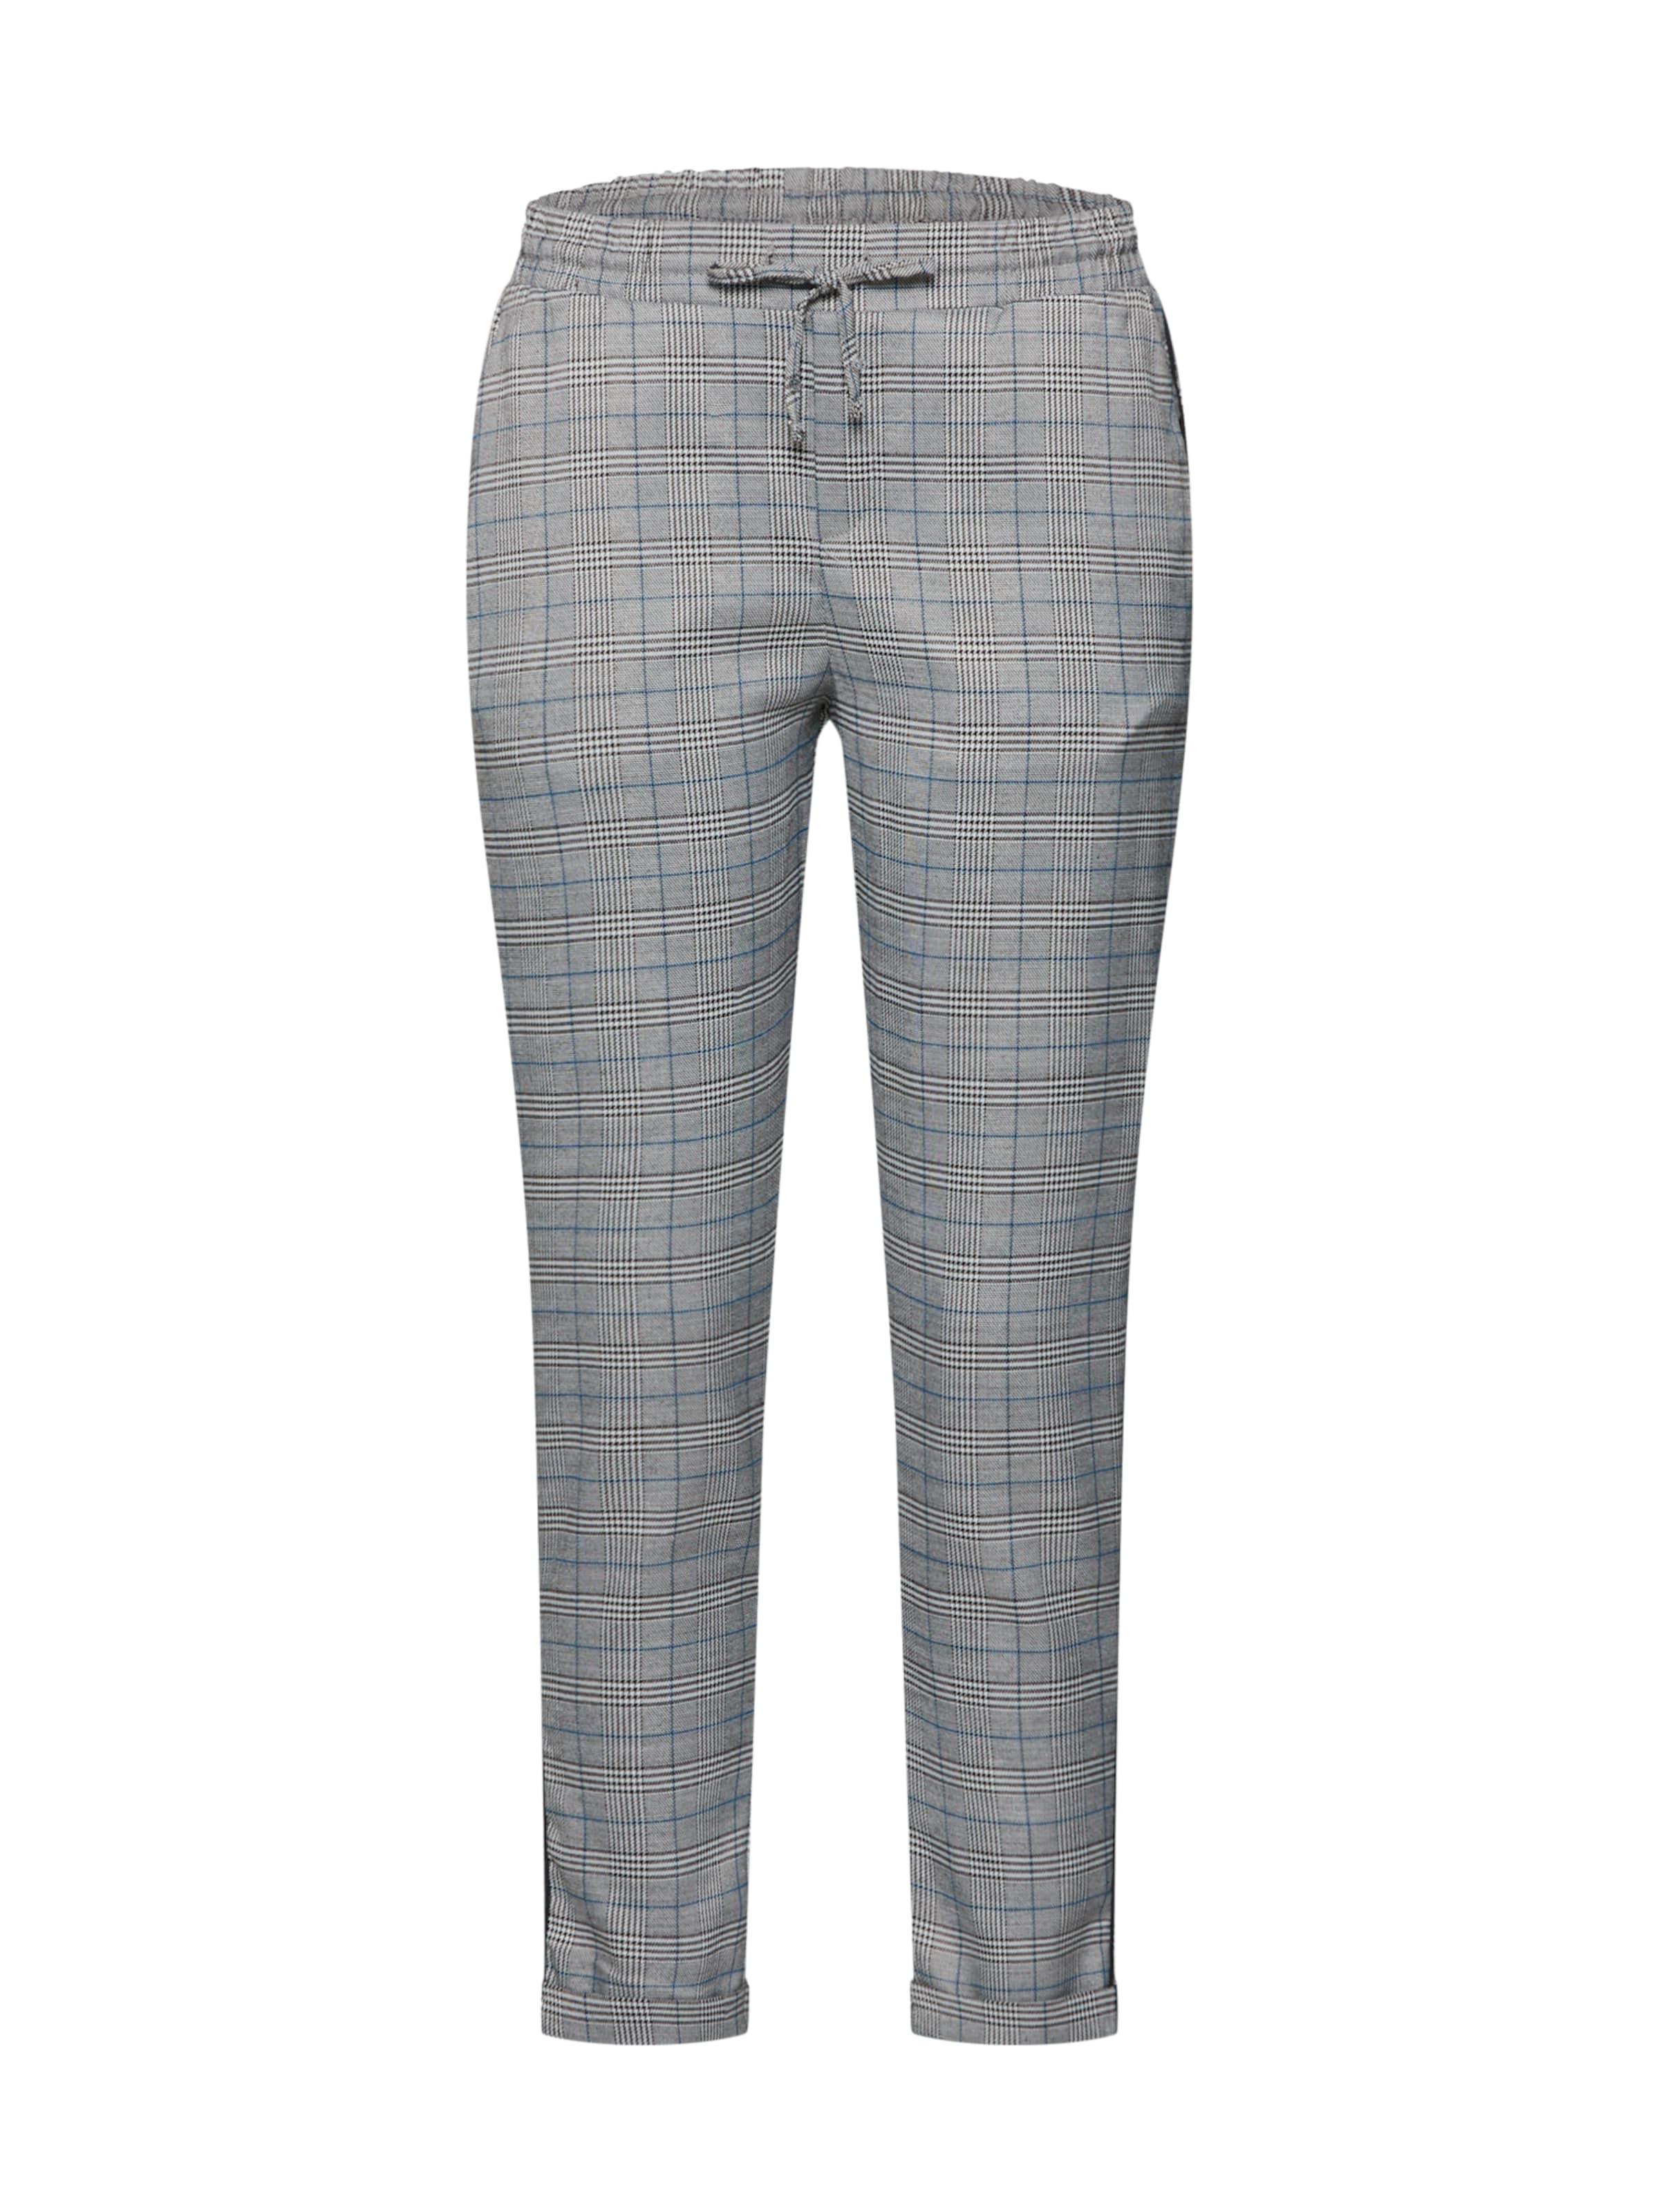 En Sublevel BleuGris En Sublevel Sublevel Pantalon BleuGris En Pantalon Pantalon Y6mbyIvf7g